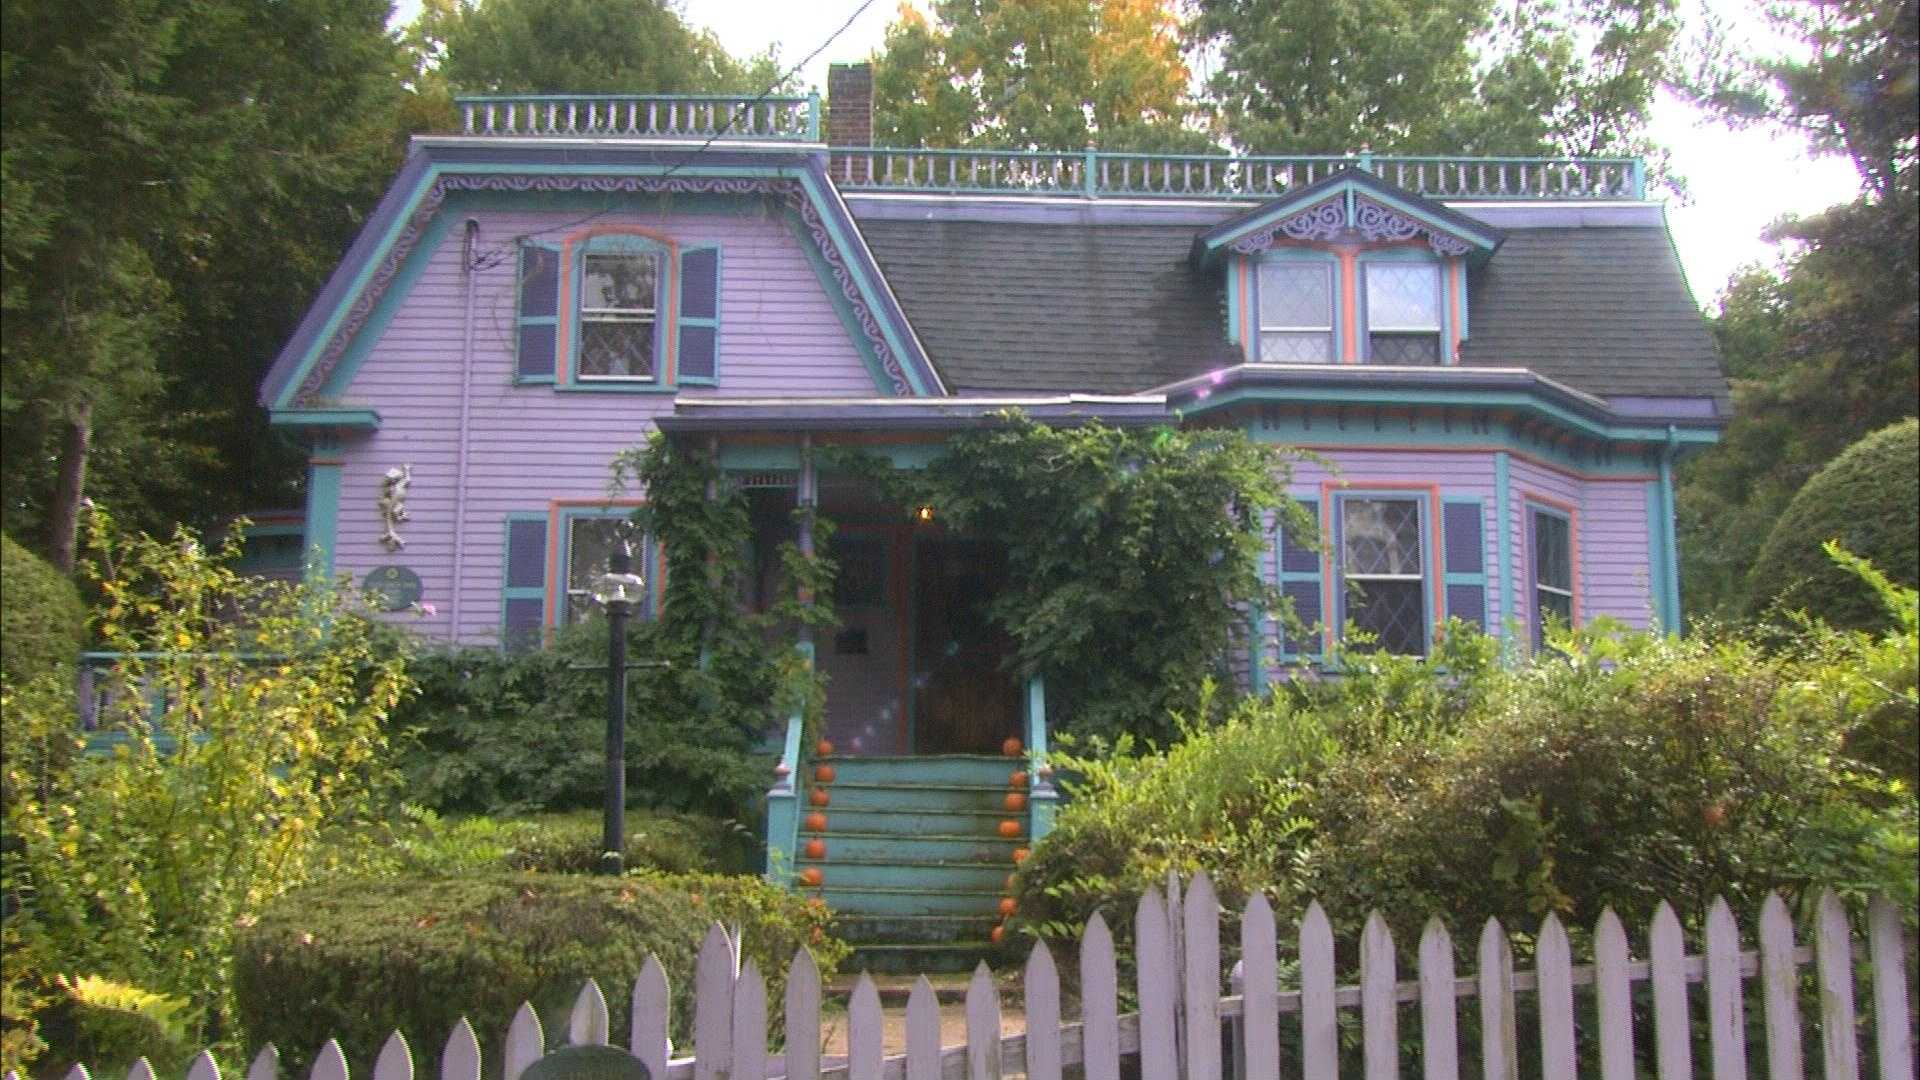 Image: Unusual Houses